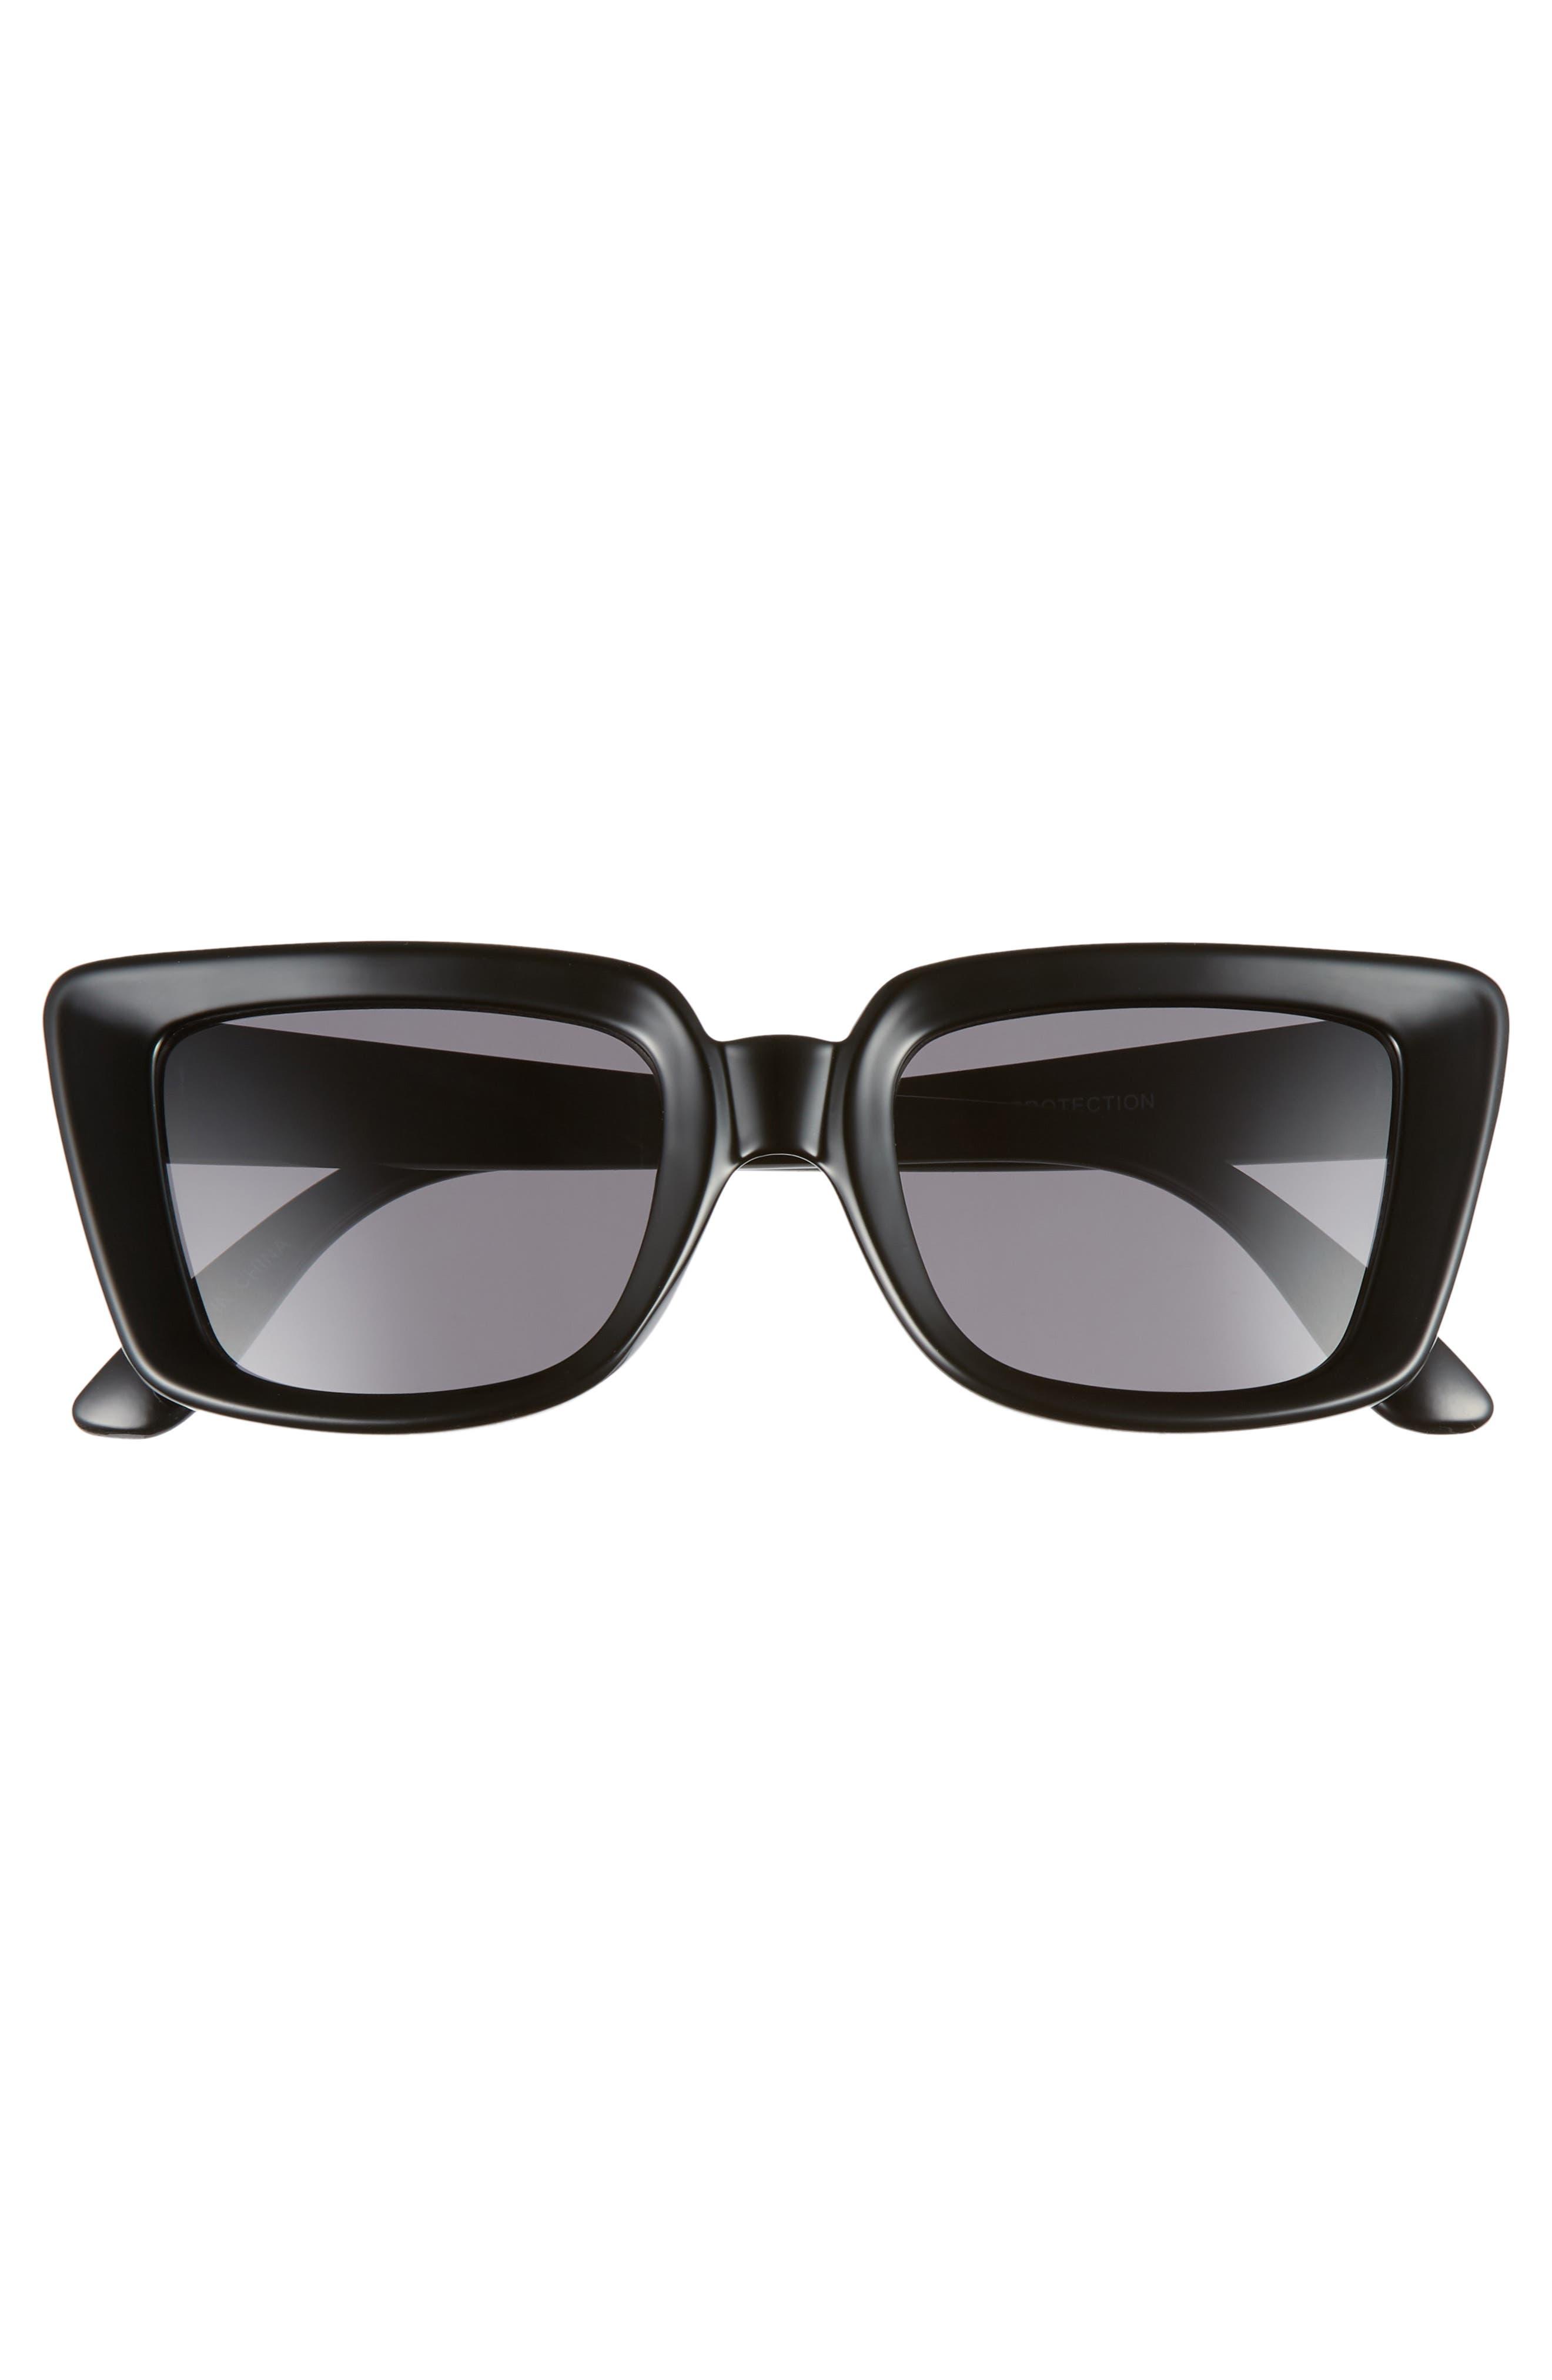 68mm Oversize Square Sunglasses,                             Alternate thumbnail 3, color,                             BLACK/ GOLD